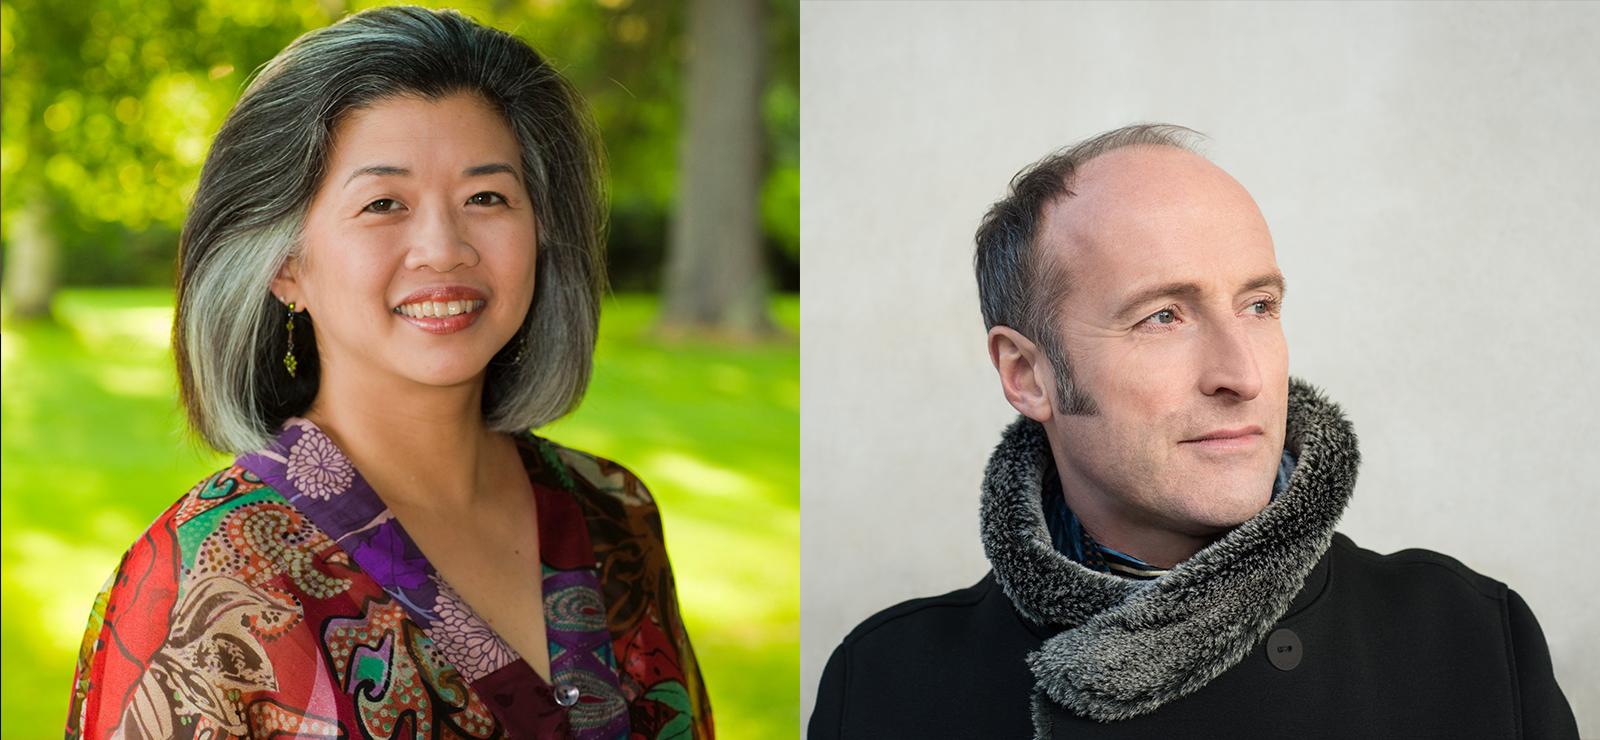 [Schubert's Winterreise] Kayo Iwama by Michael Lynch; Rufus Müller by Eleanor Bentall